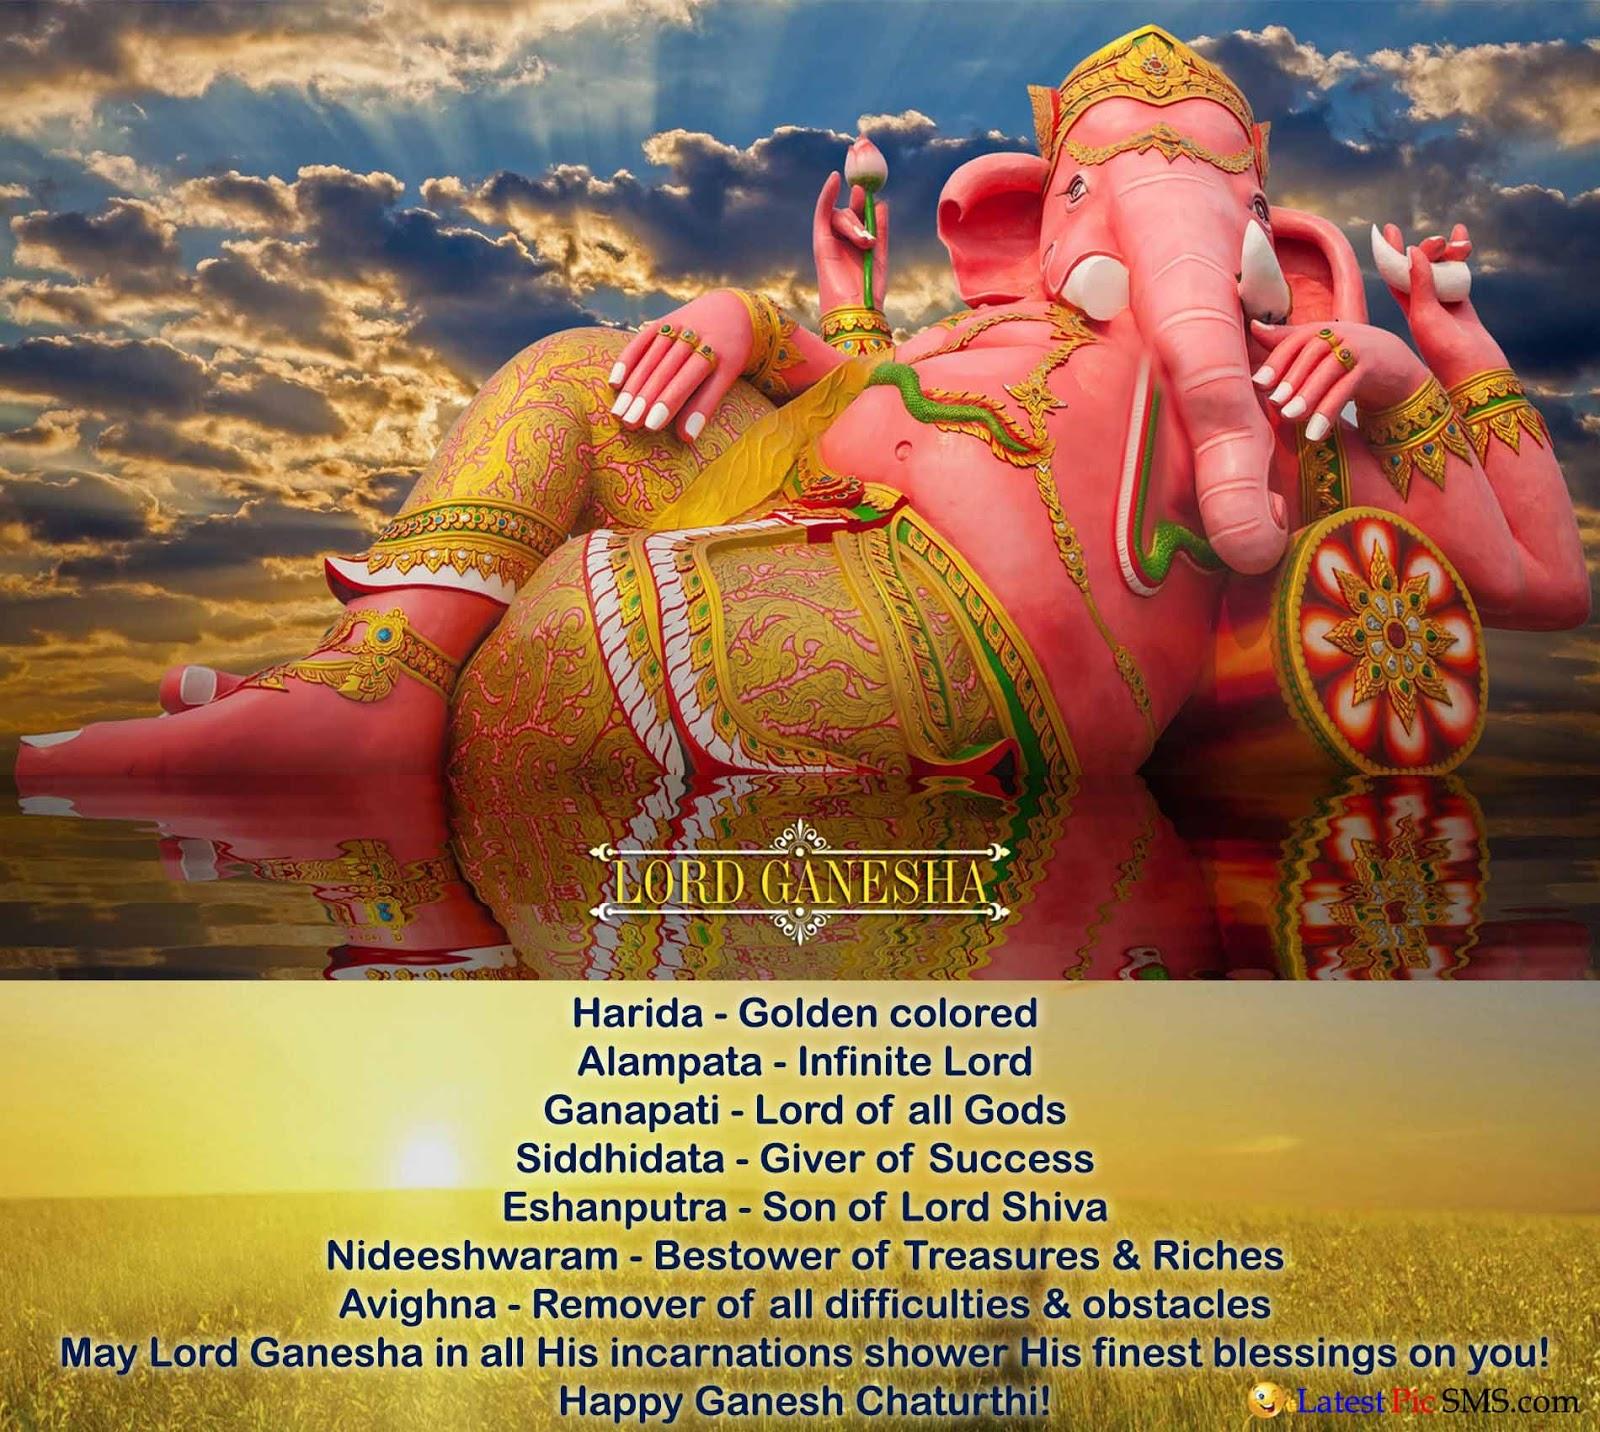 Big Statue of Lord Ganesha HD wallpaper Image